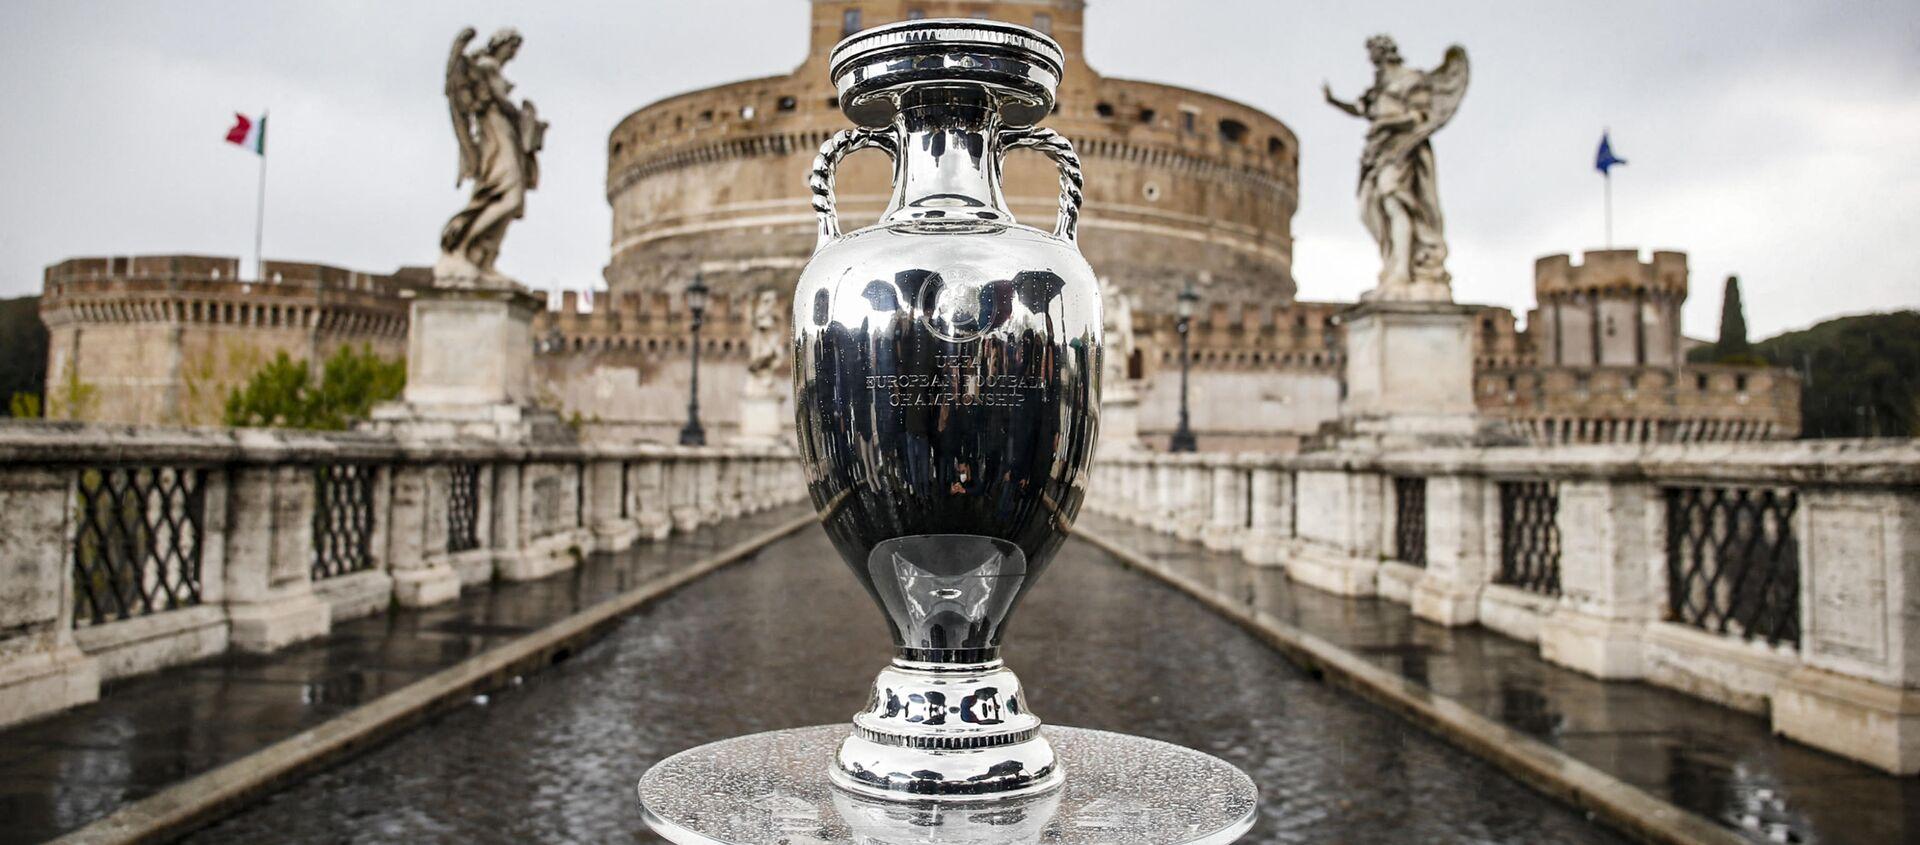 Кубок Евро-2020 в Риме, фото из архива - Sputnik Азербайджан, 1920, 03.05.2021